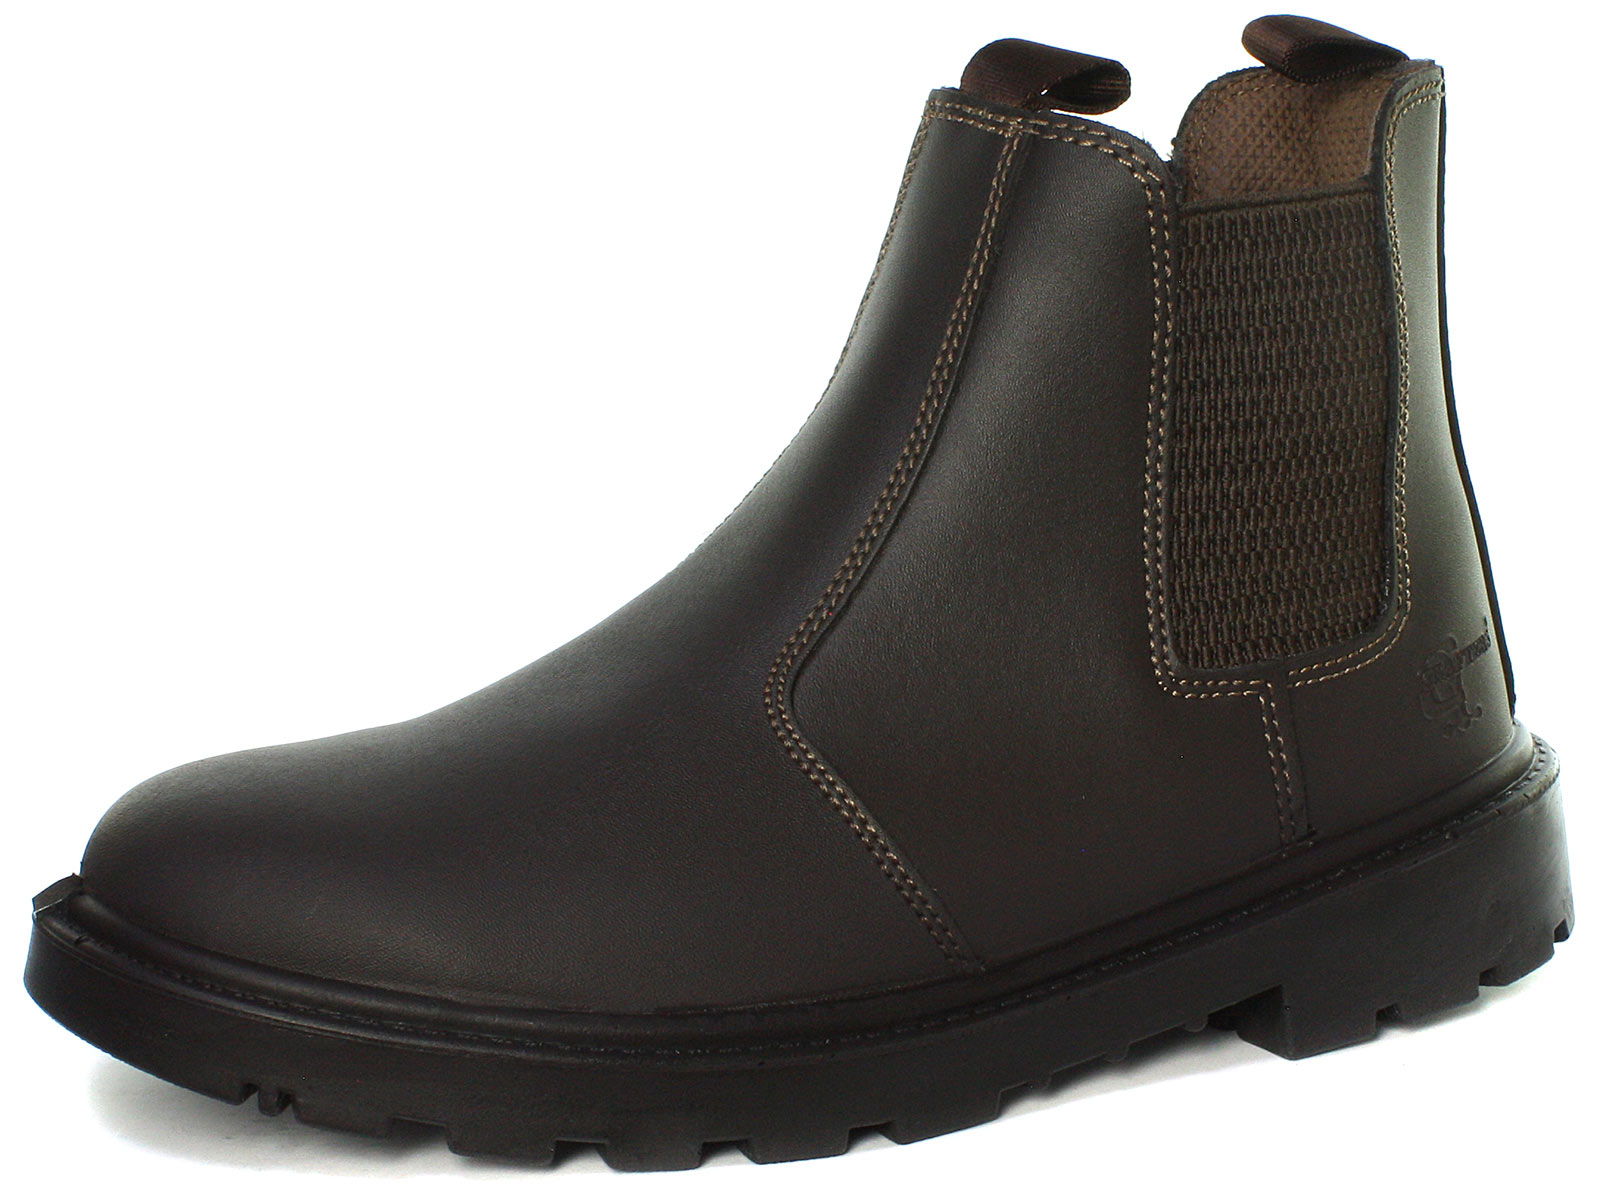 Grafters Grinder Brown Twin Gusset Dealer Mens Safety Boots Size UK 8 (EU 42)